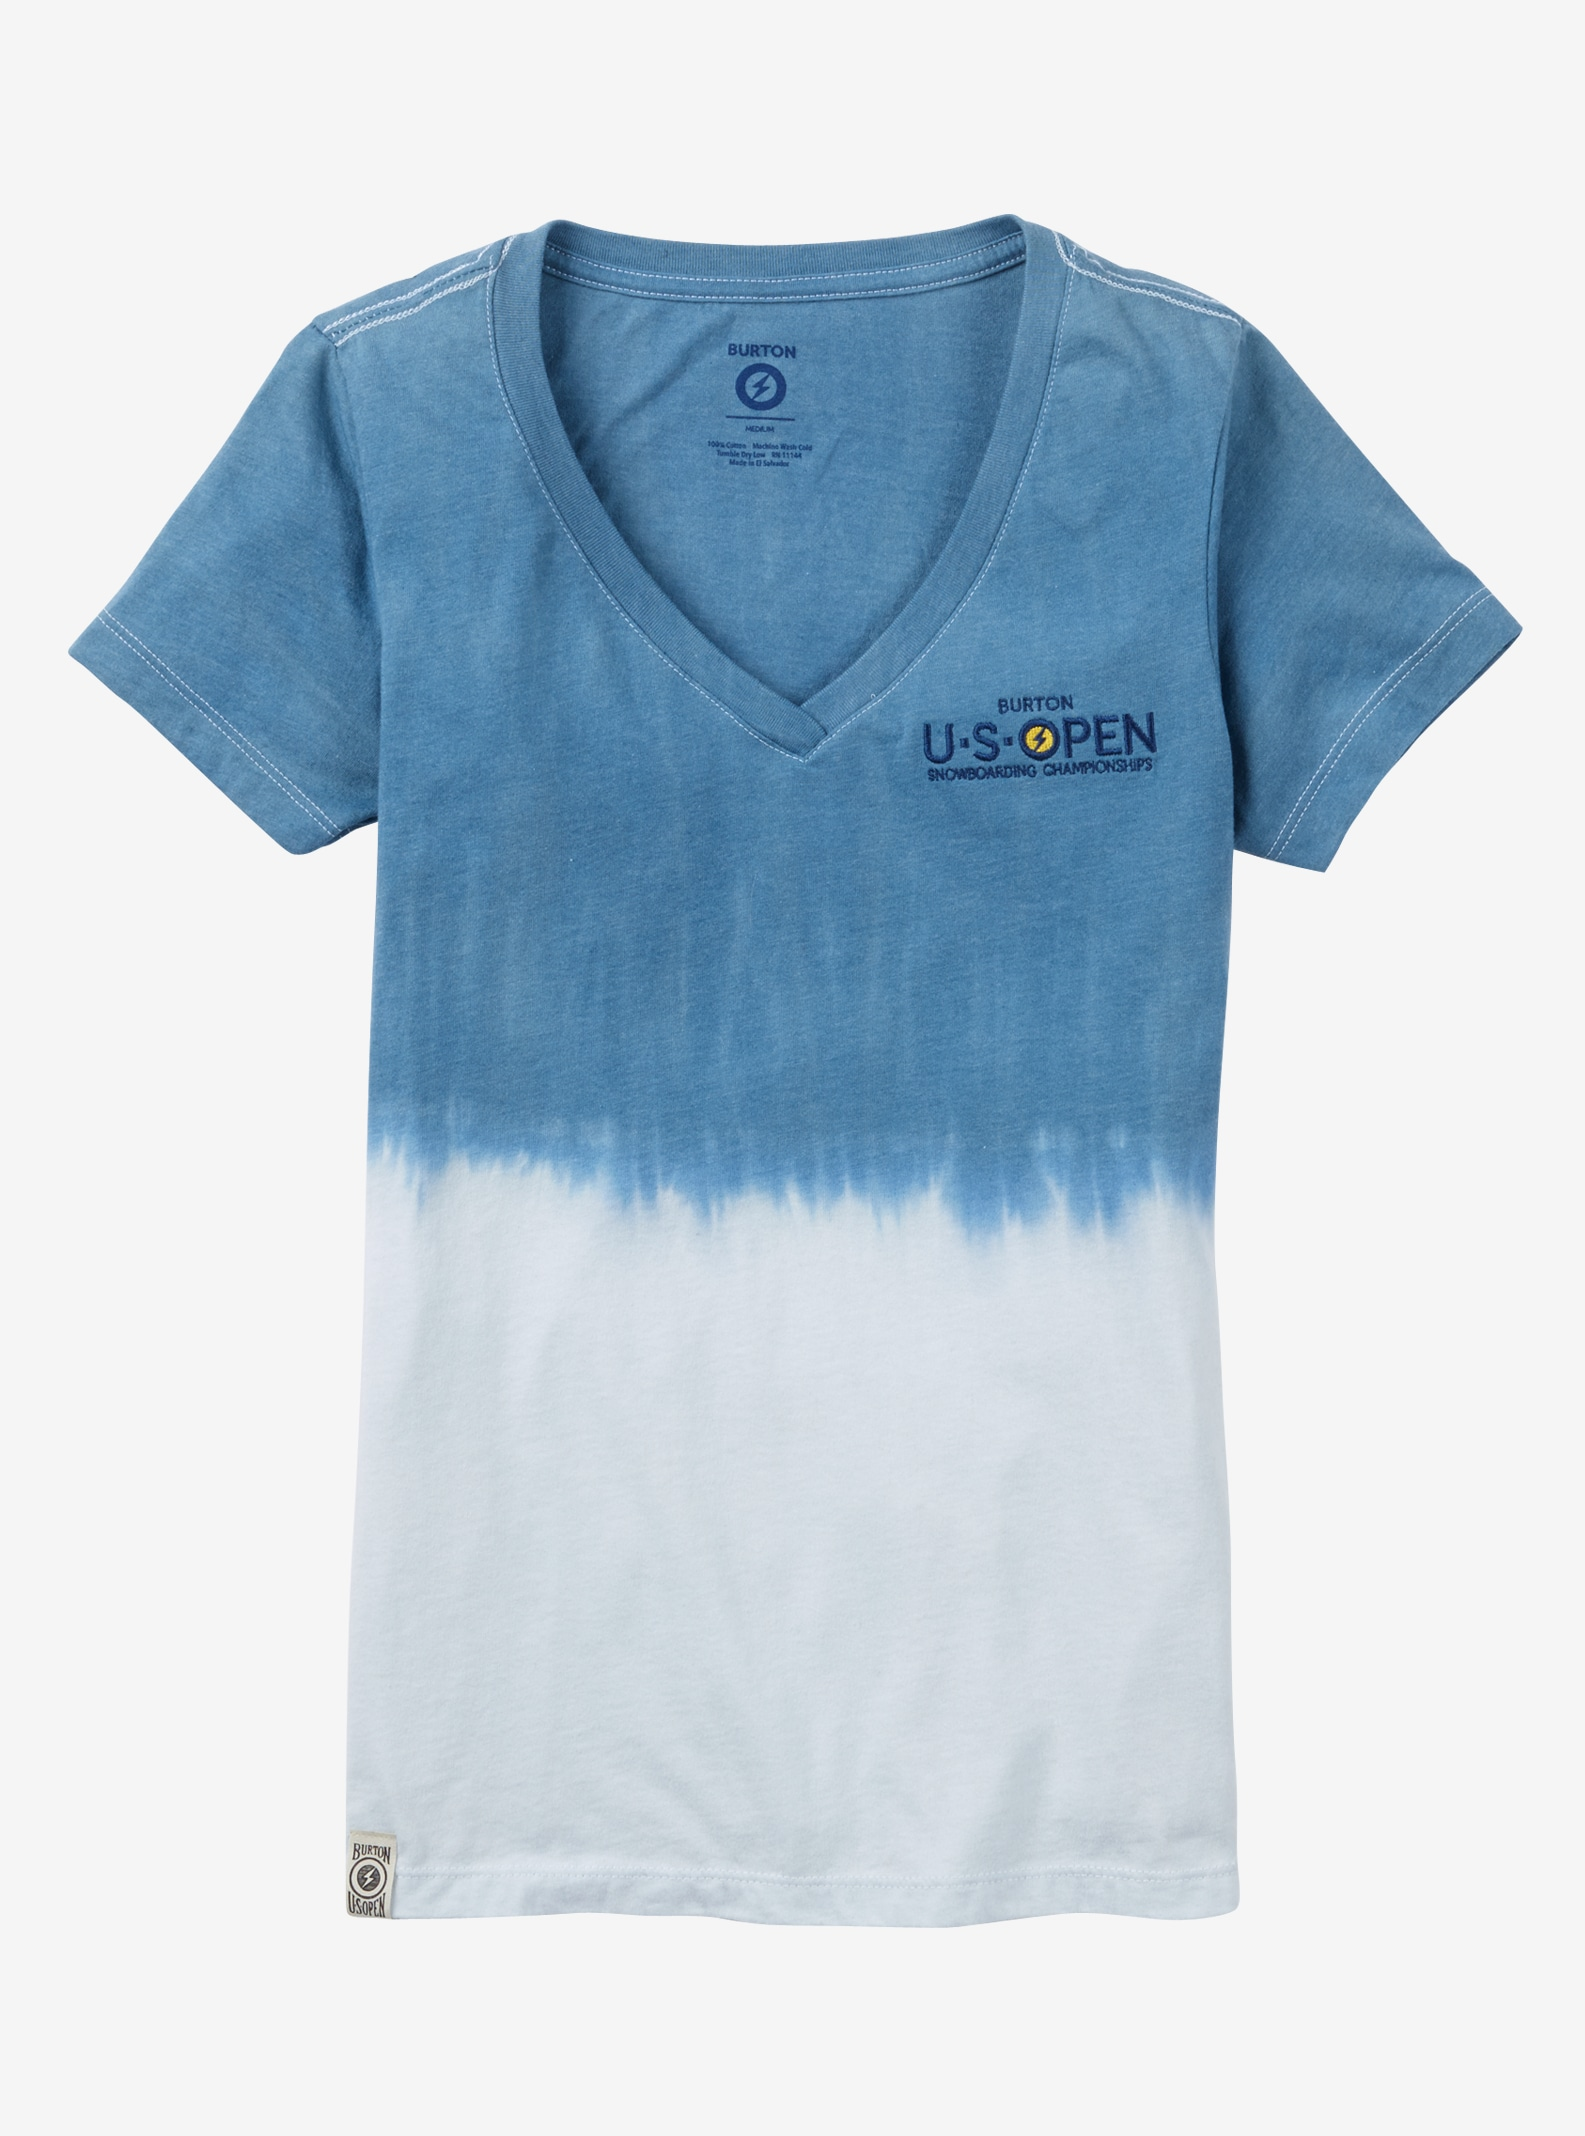 Burton US Open Fade Short Sleeve T Shirt shown in Neptune Fade